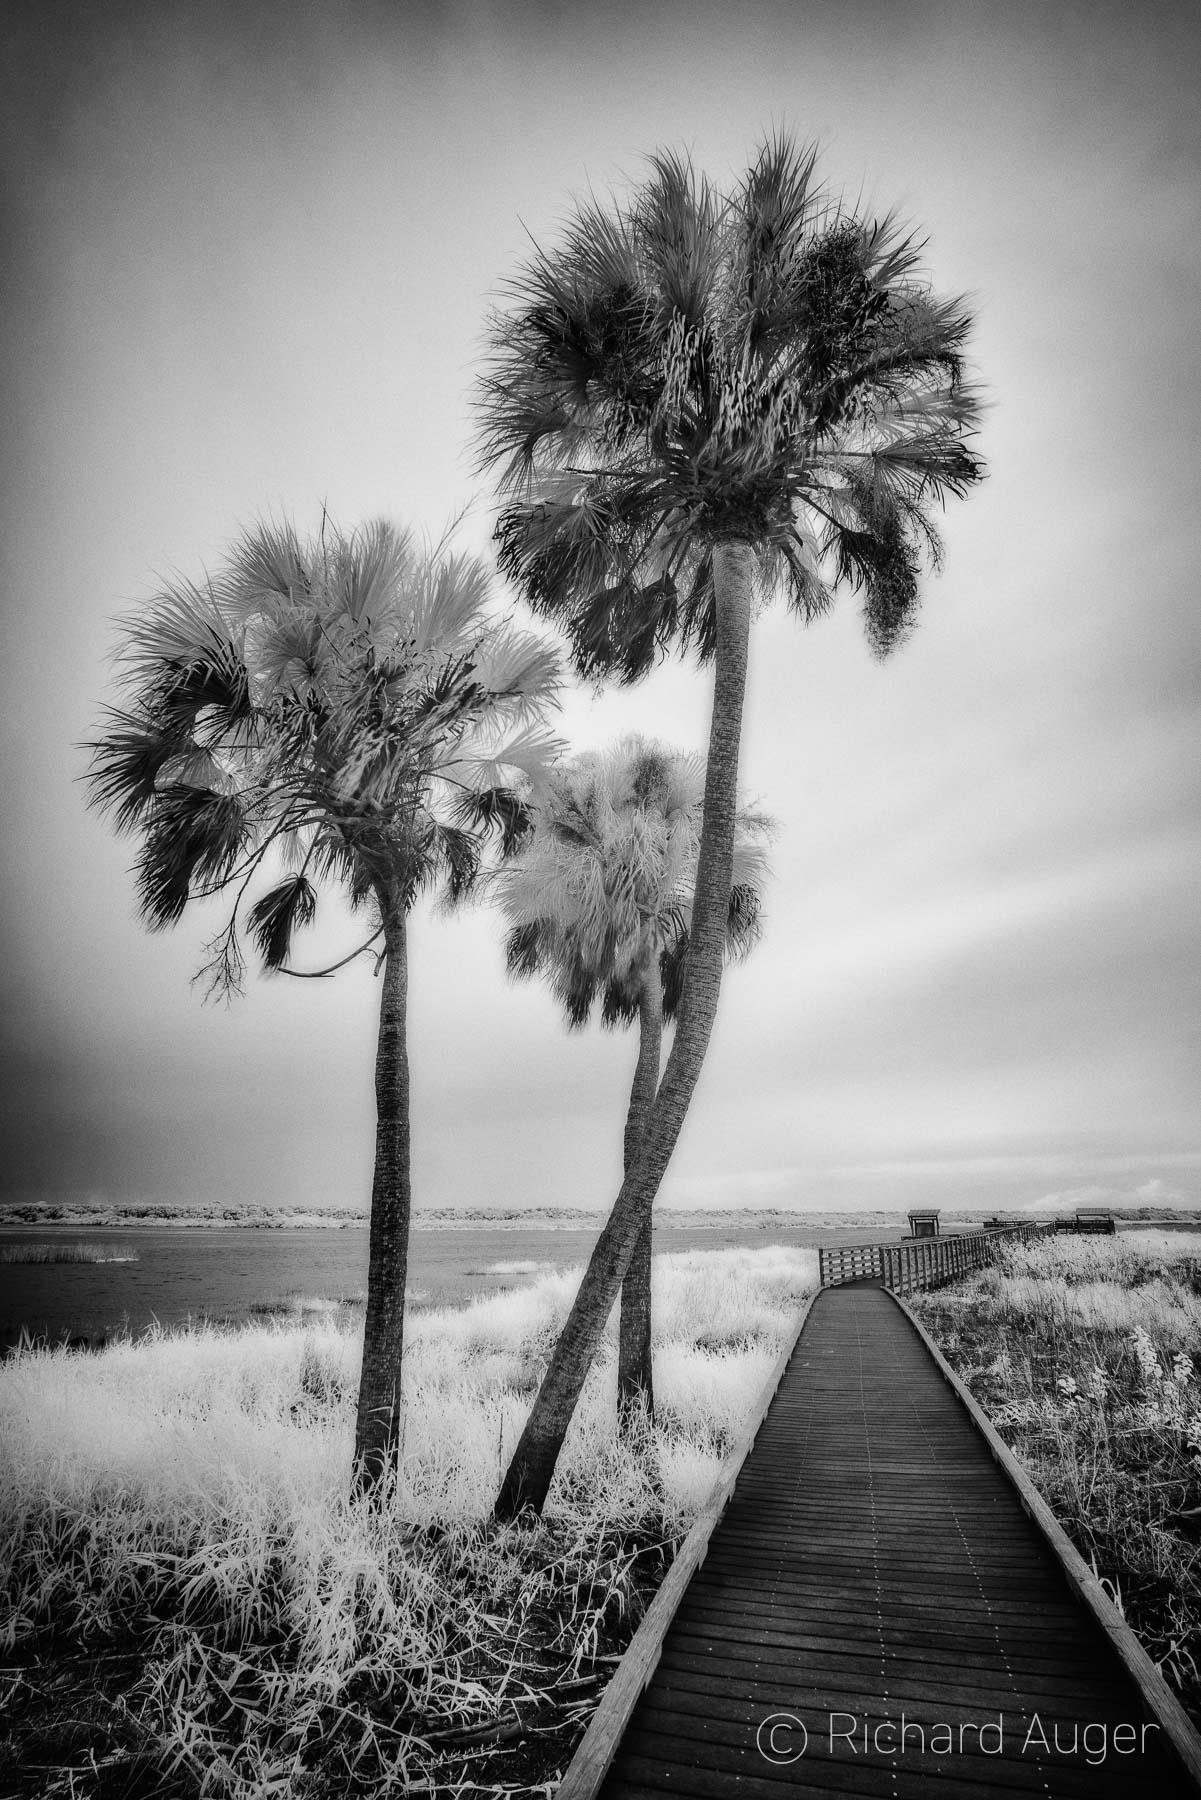 Myakka River State Park, Florida, Sarasota, Birdwalk, Palm Trees, Swamp, River, Black and White, Photograph, Landscape